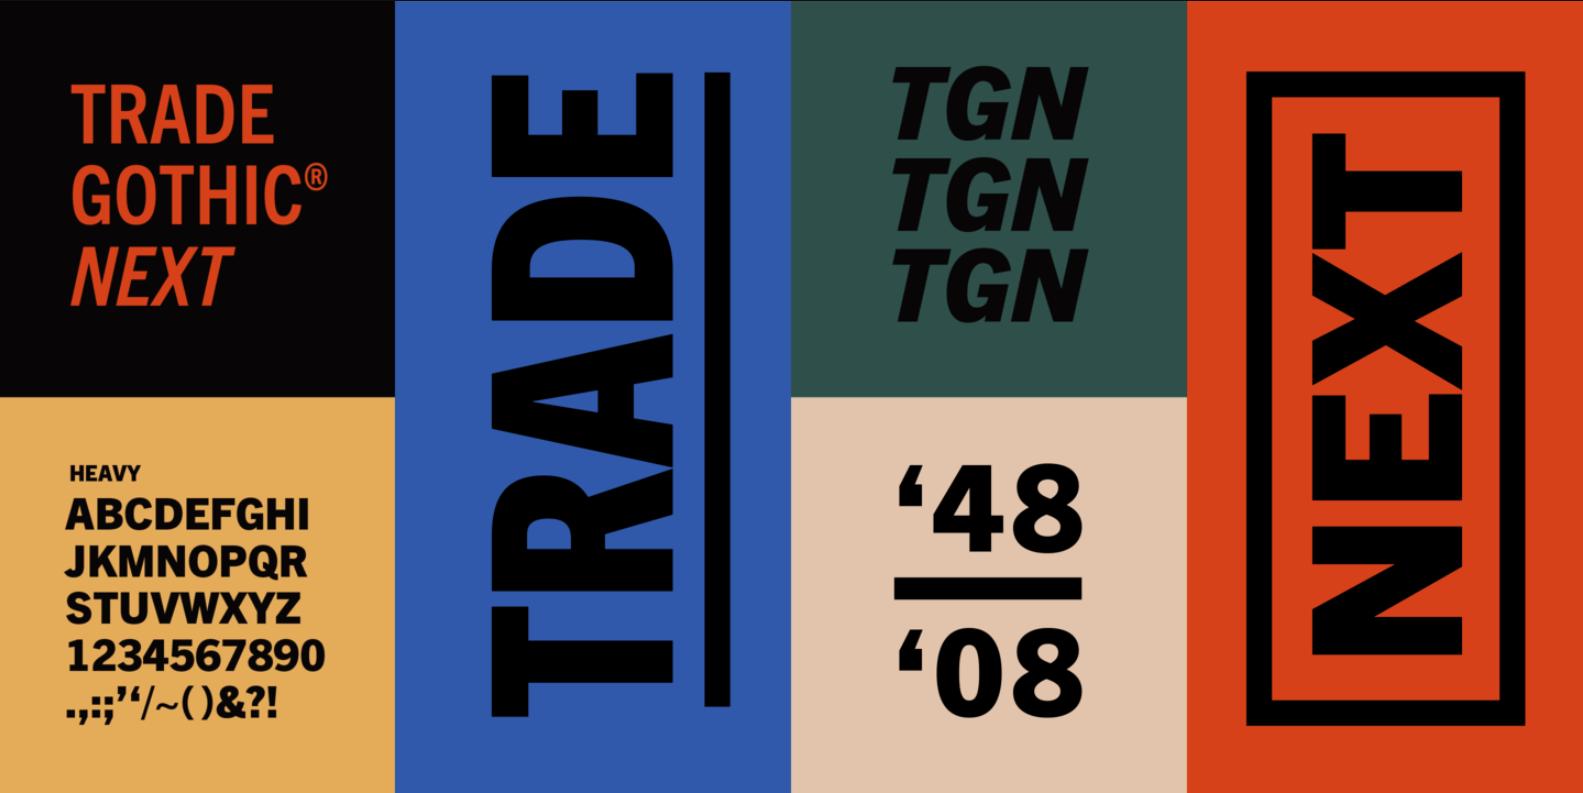 Trade Gothic Next LT